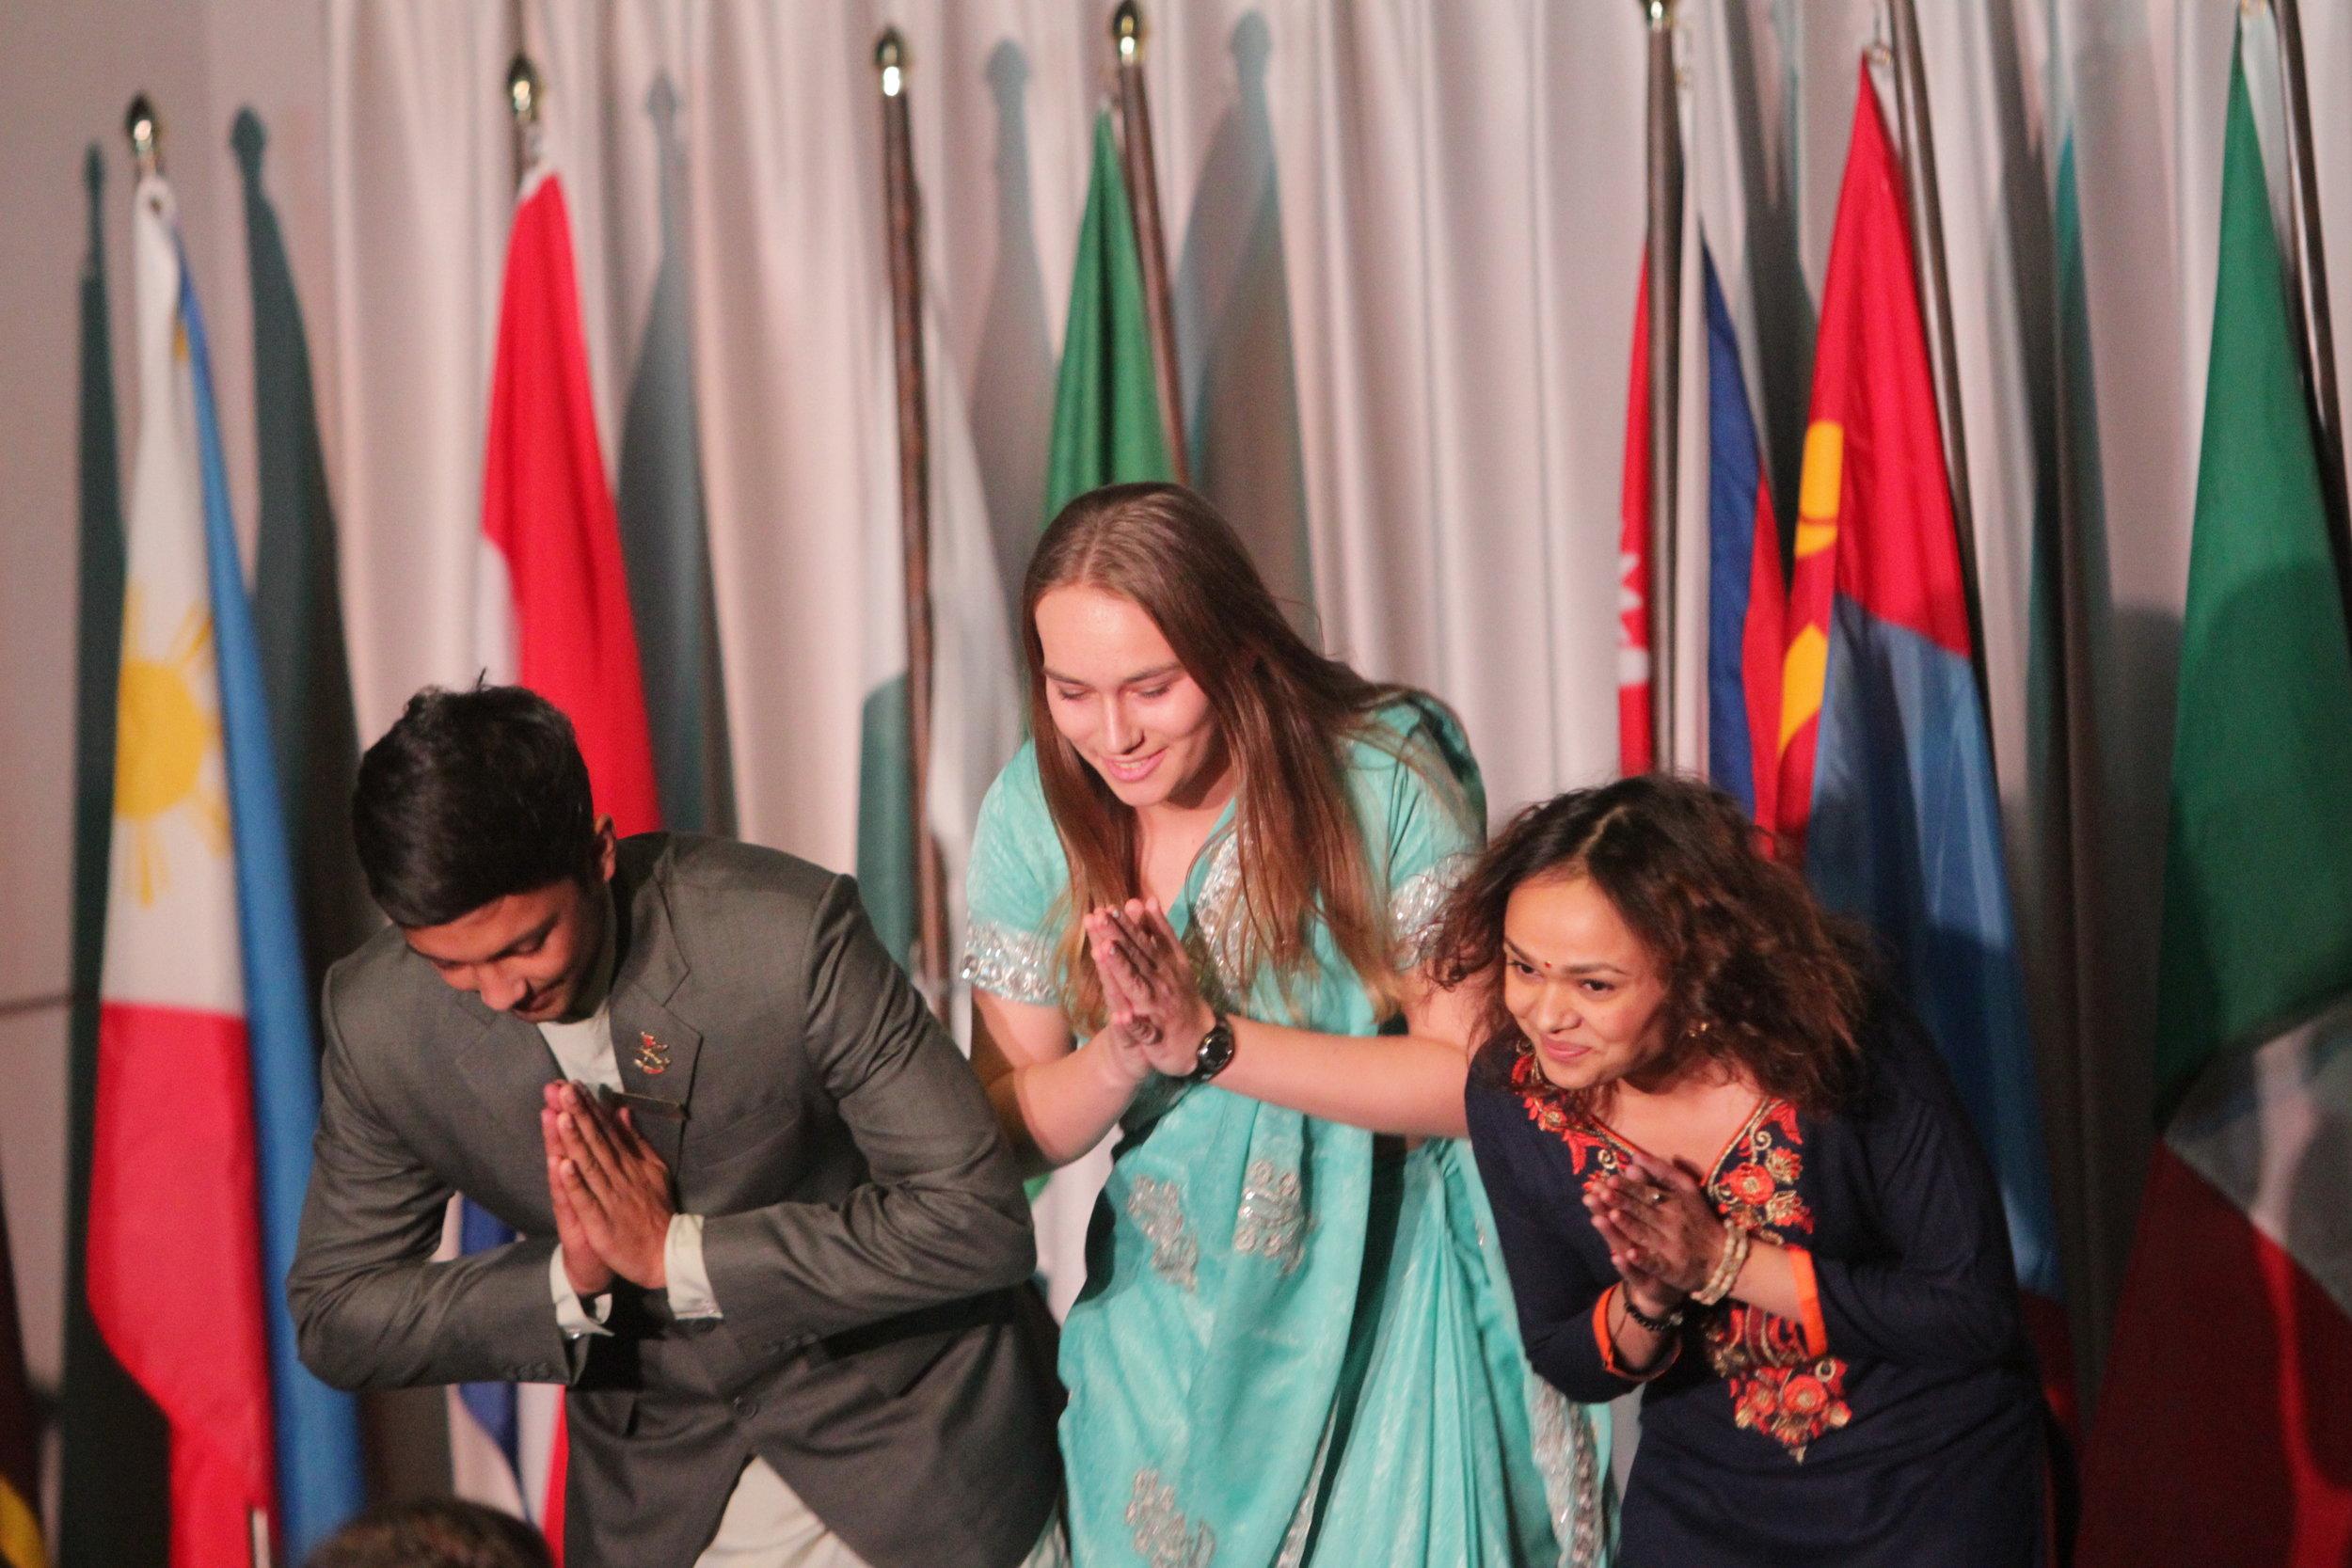 Sophomore Ishan Gauli, sophomore Michaela Scheer and senior Purnima Karki representing Nepal